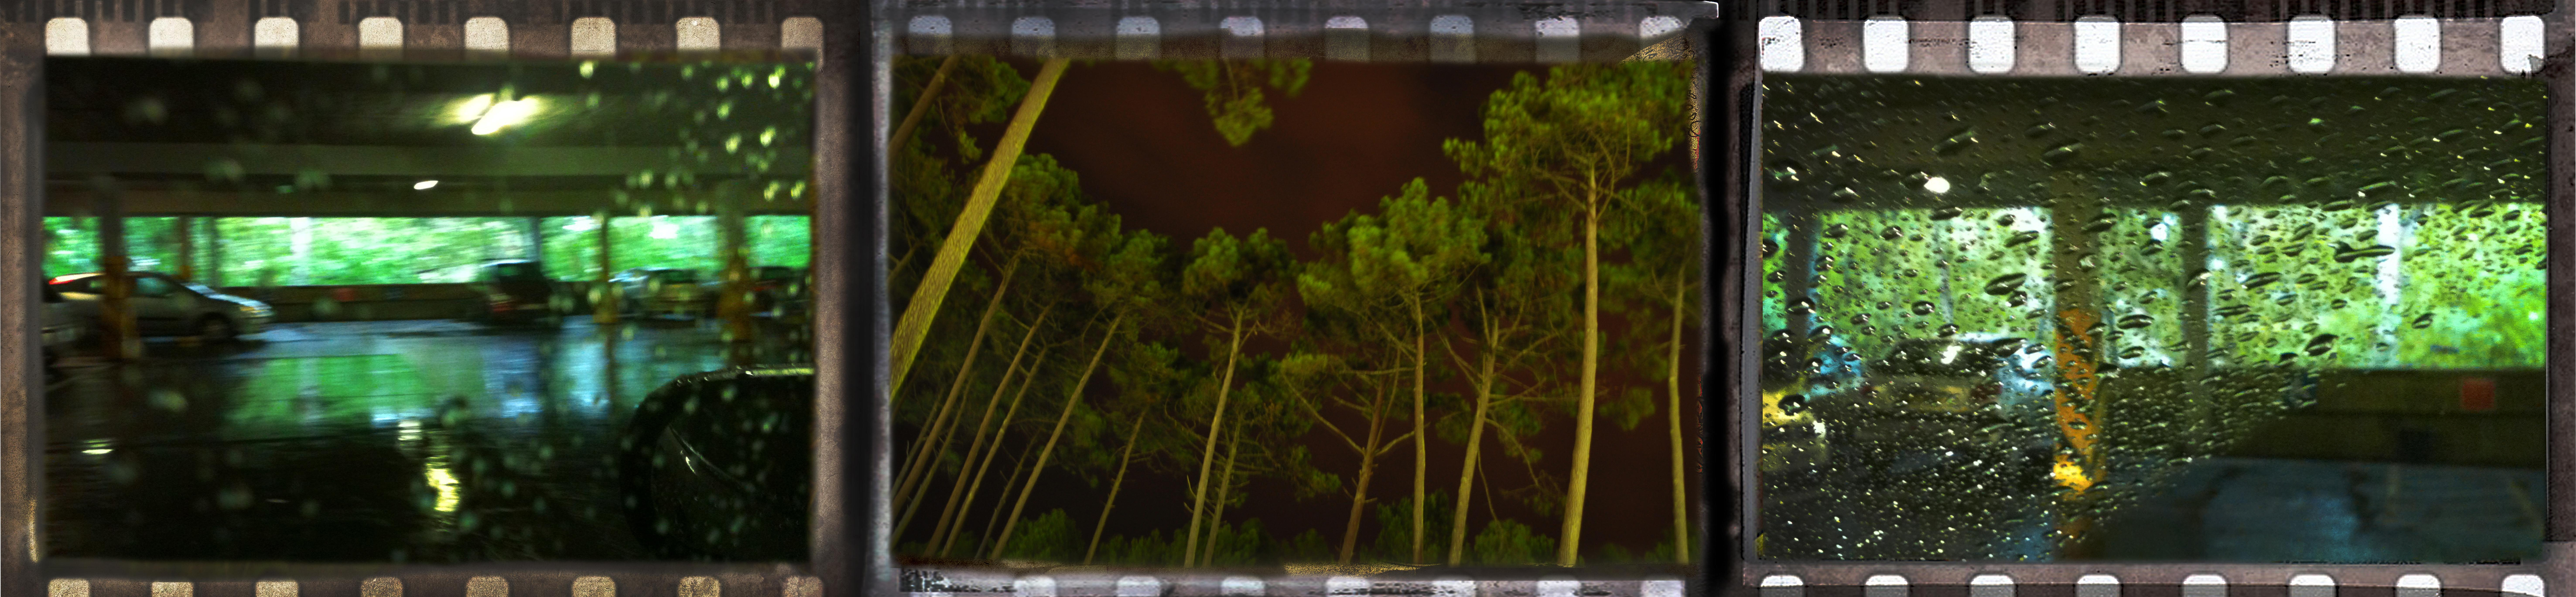 Yellow Uprights Film Strip